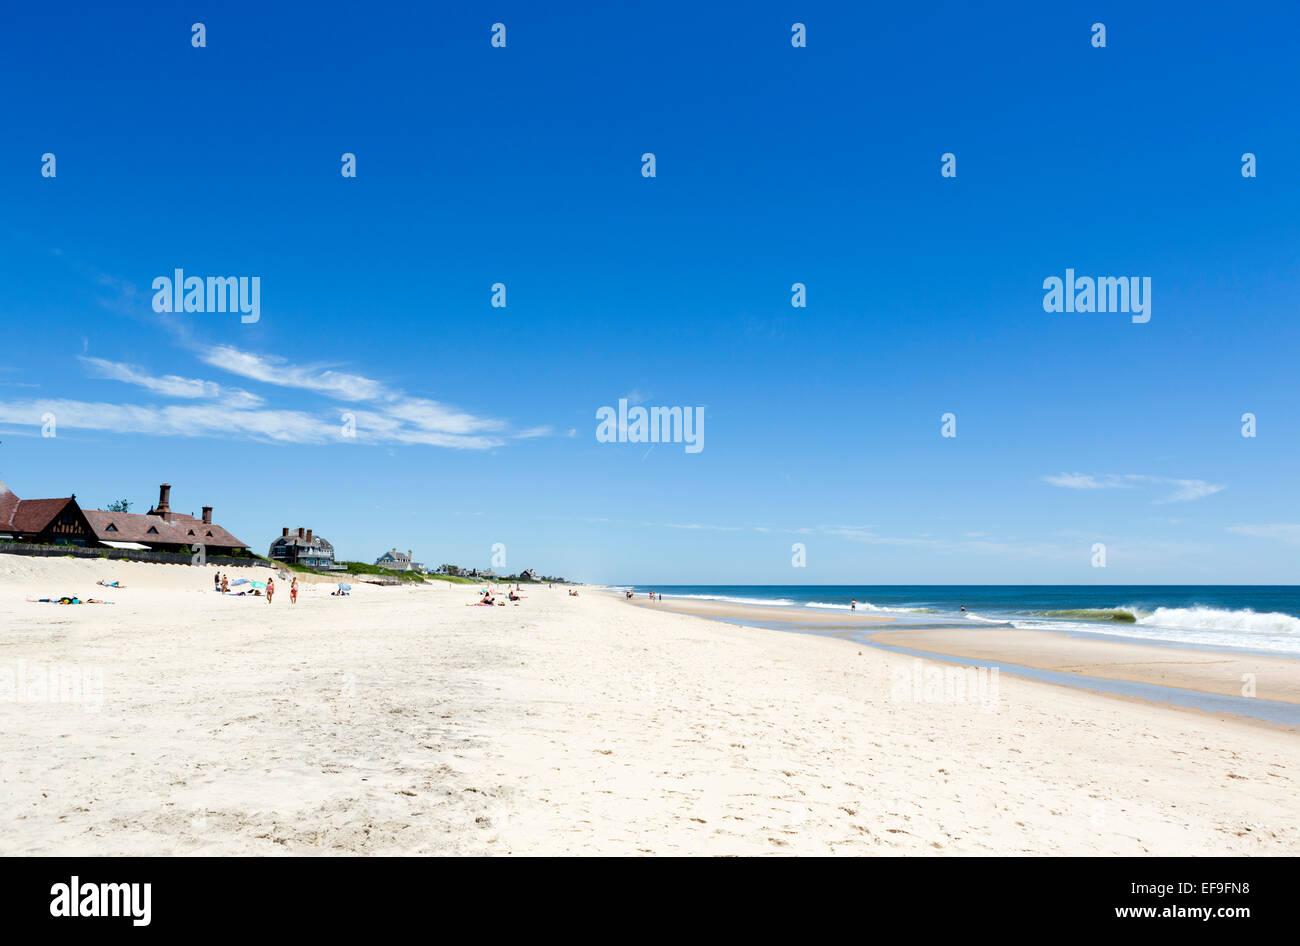 Beach at Southampton, The Hamptons, Suffolk County, Long Island , NY, USA Stock Photo